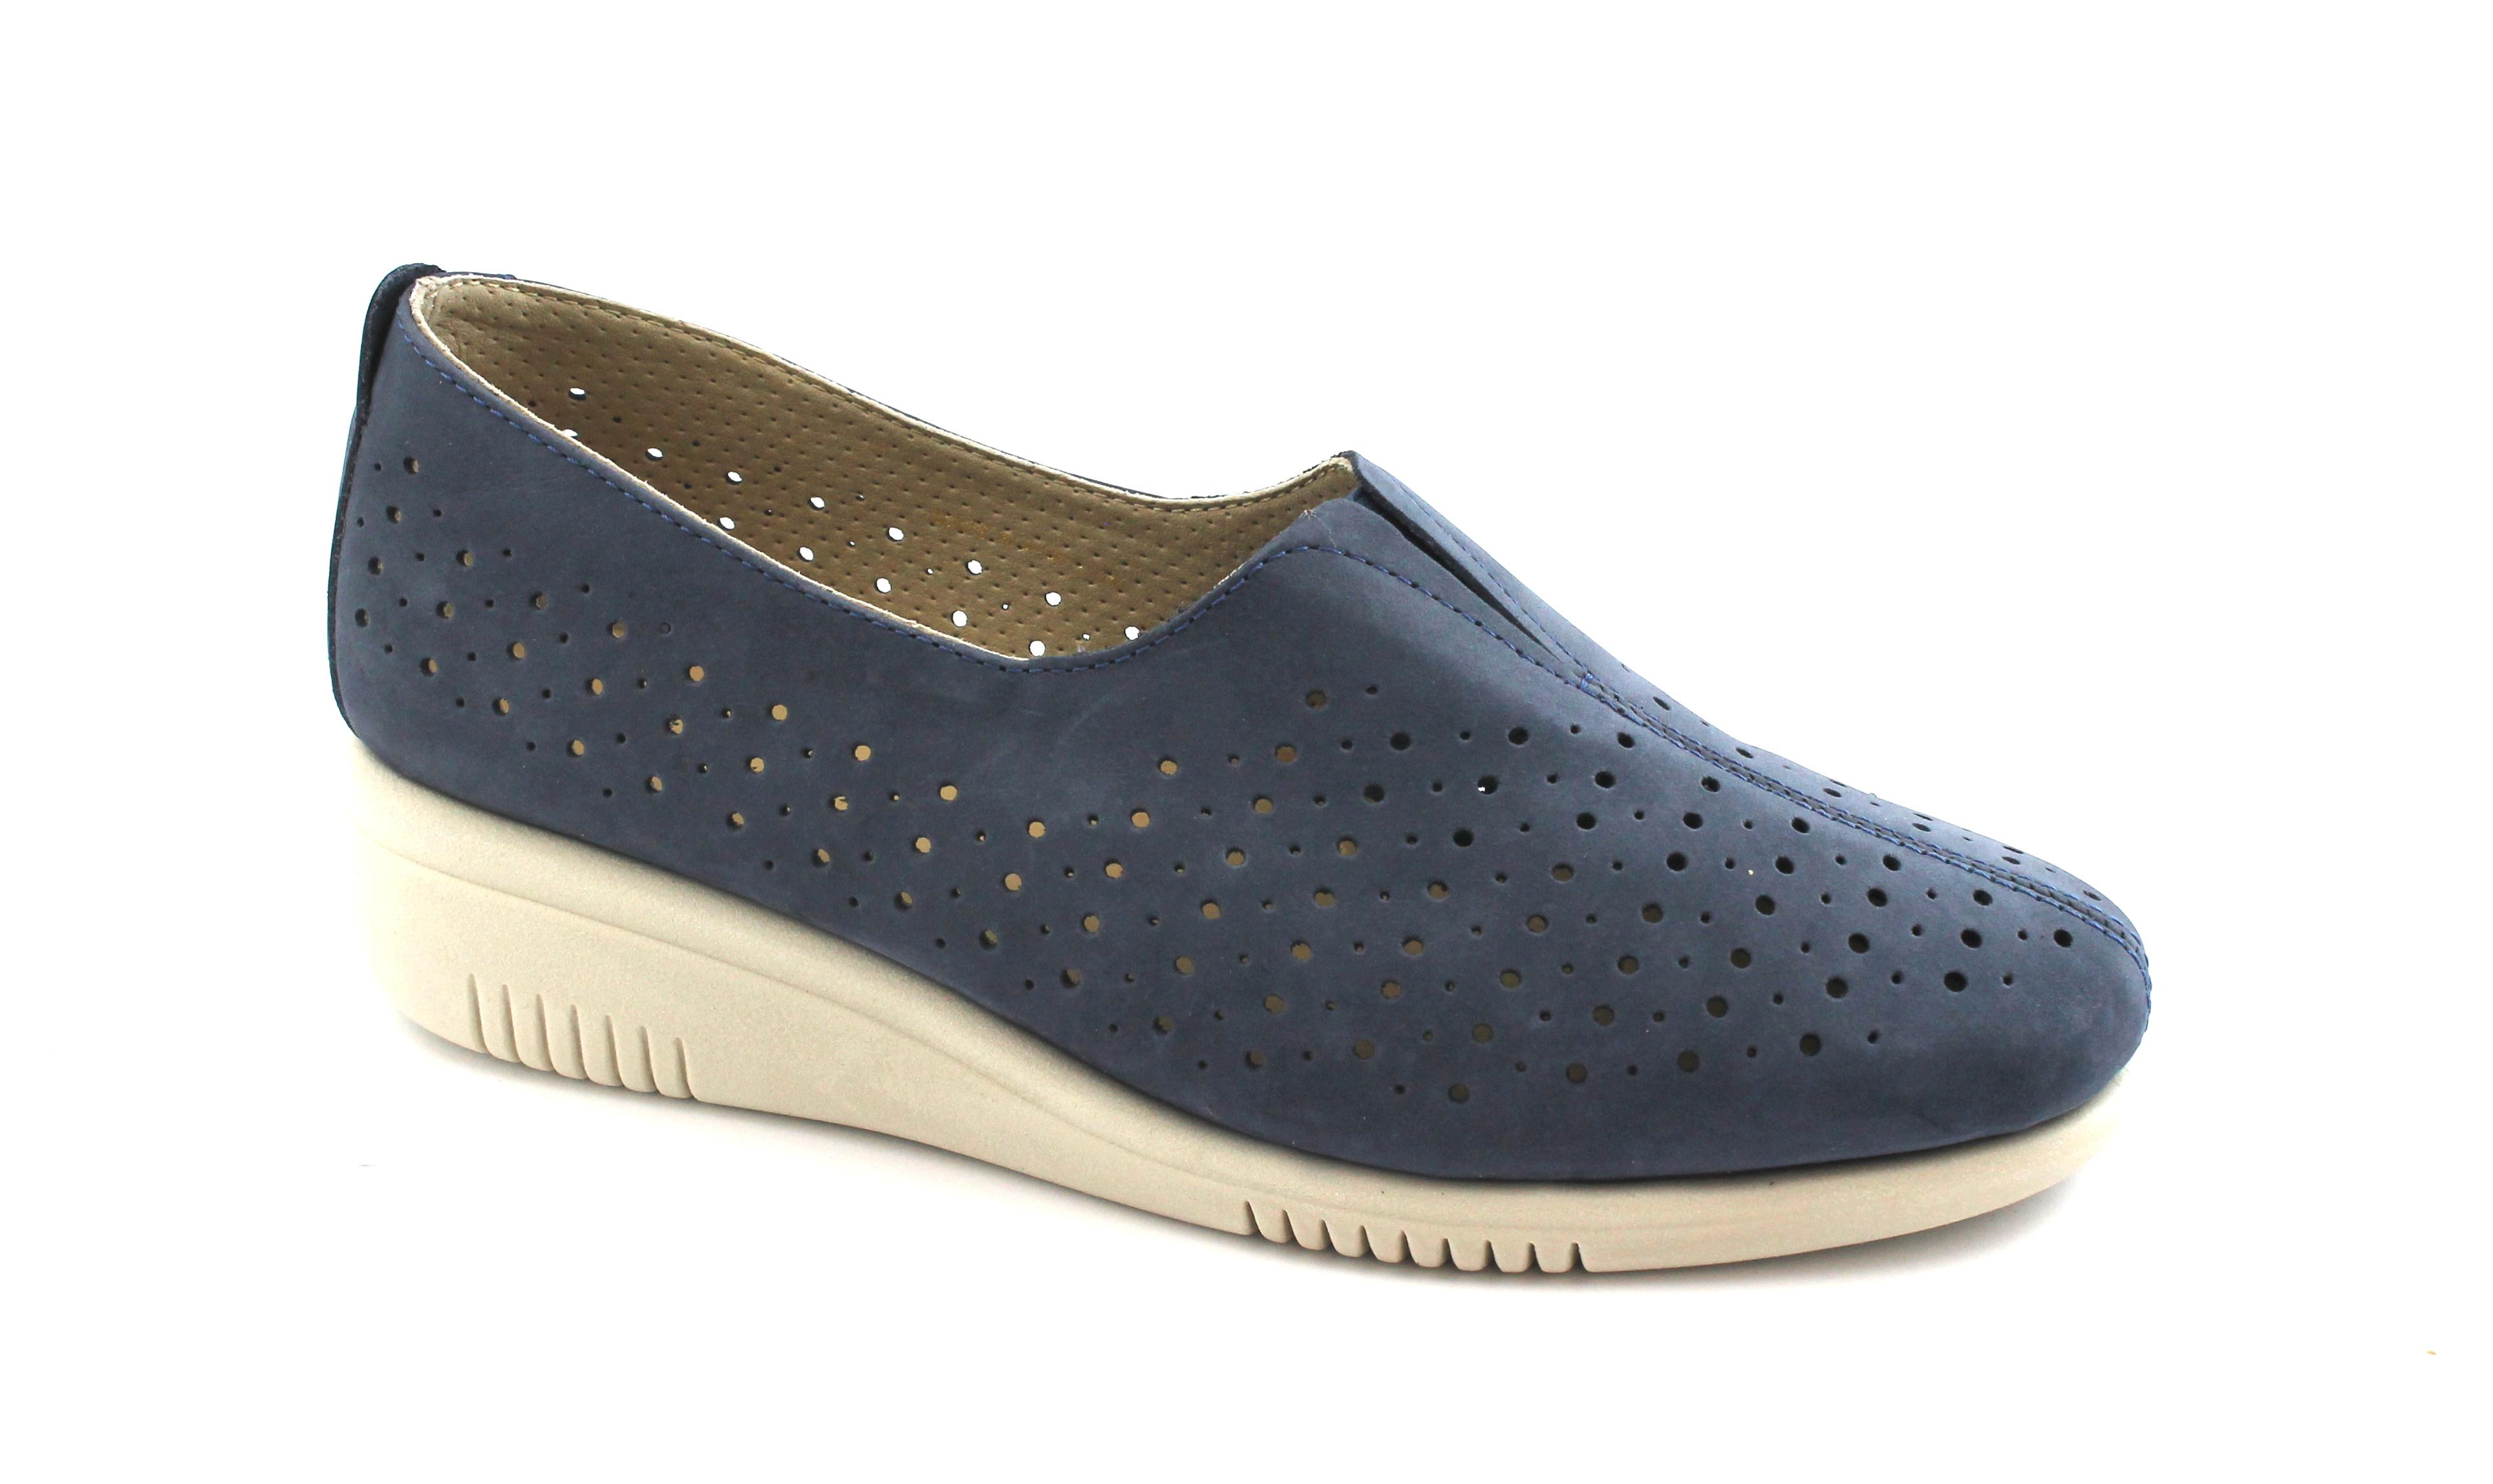 GRUNLAND-SIRA-SC3763-blu-scarpe-donna-zeppetta-elastico-forata